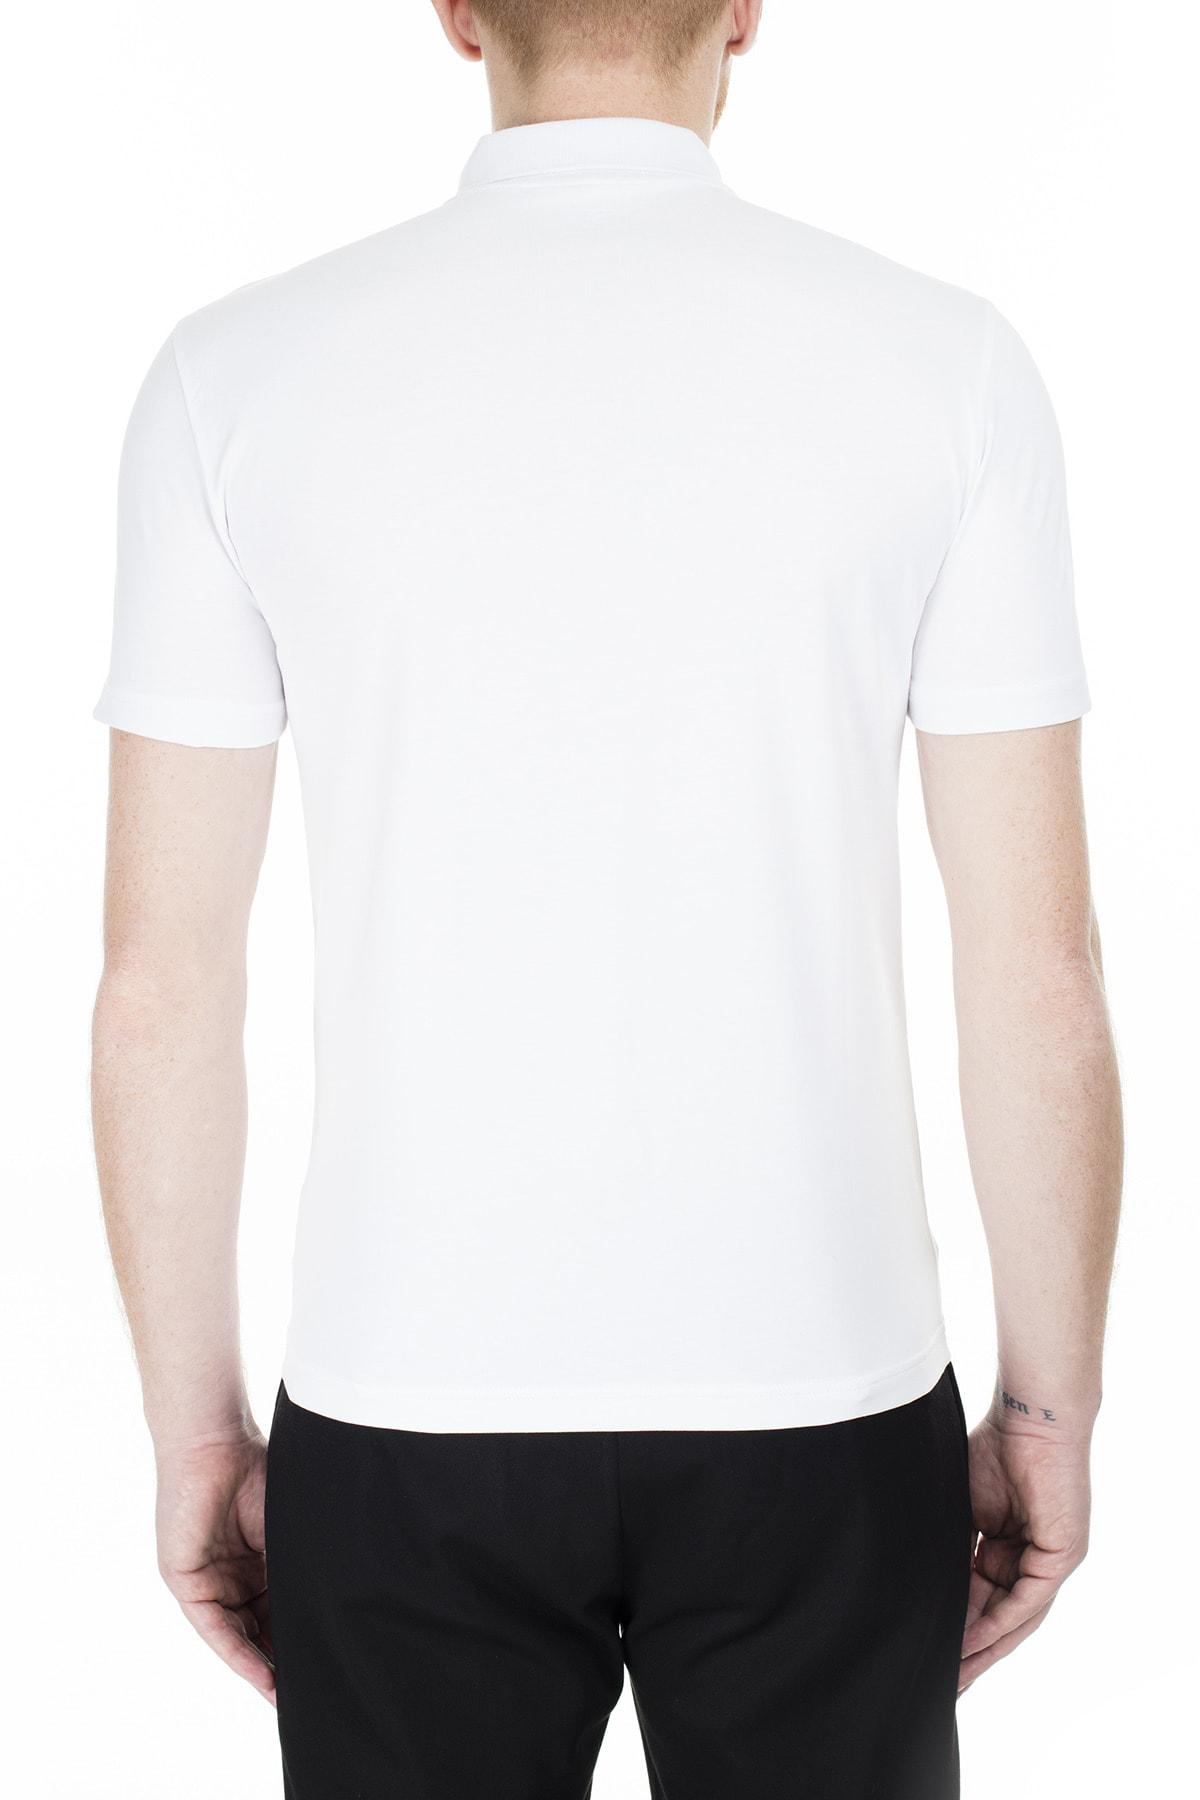 EA7 Regular Fit Polo T Shirt Erkek Polo S 6Gpf16 Pj03Z 1100 2